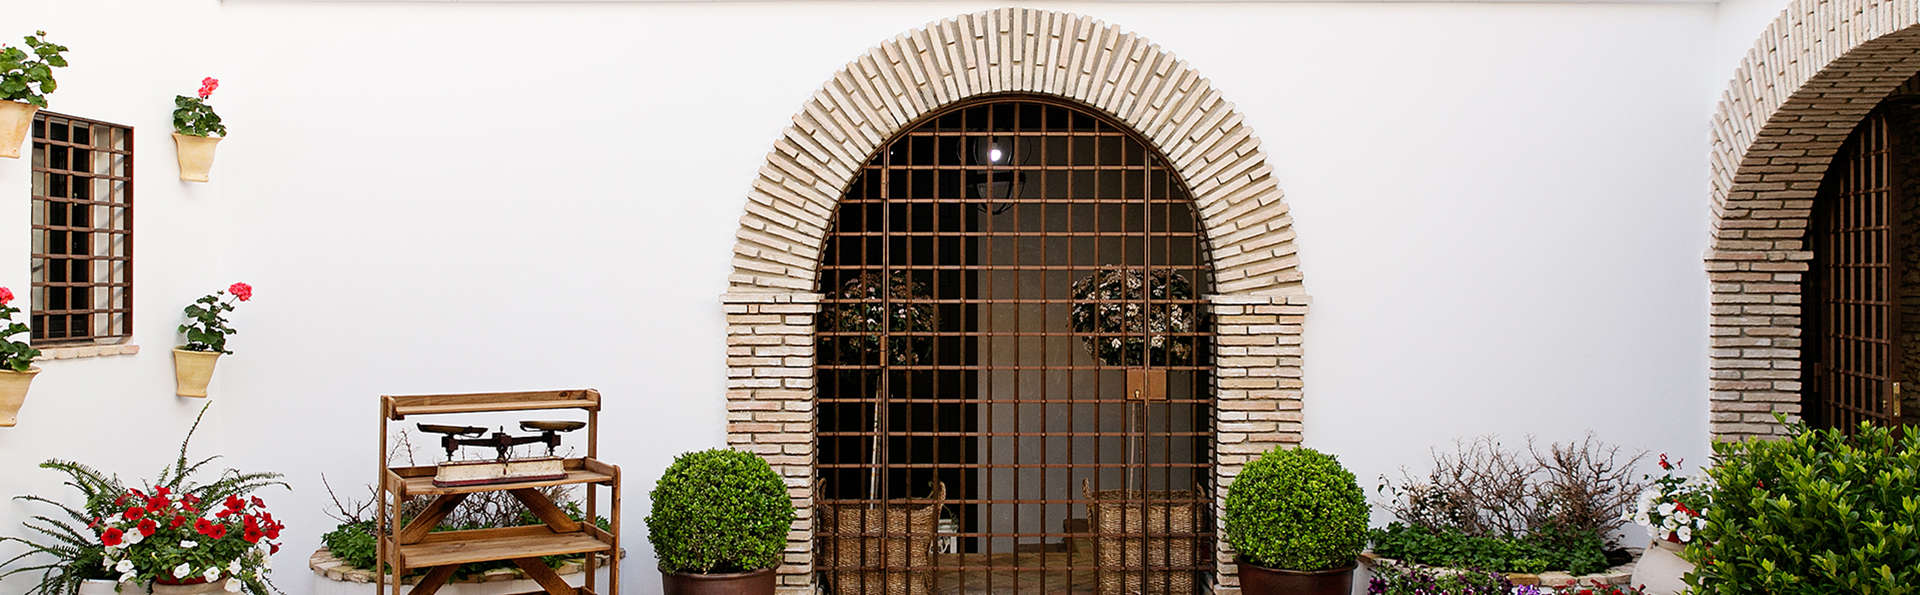 Suites La Posada de Pilar - Edit_Terrace.jpg